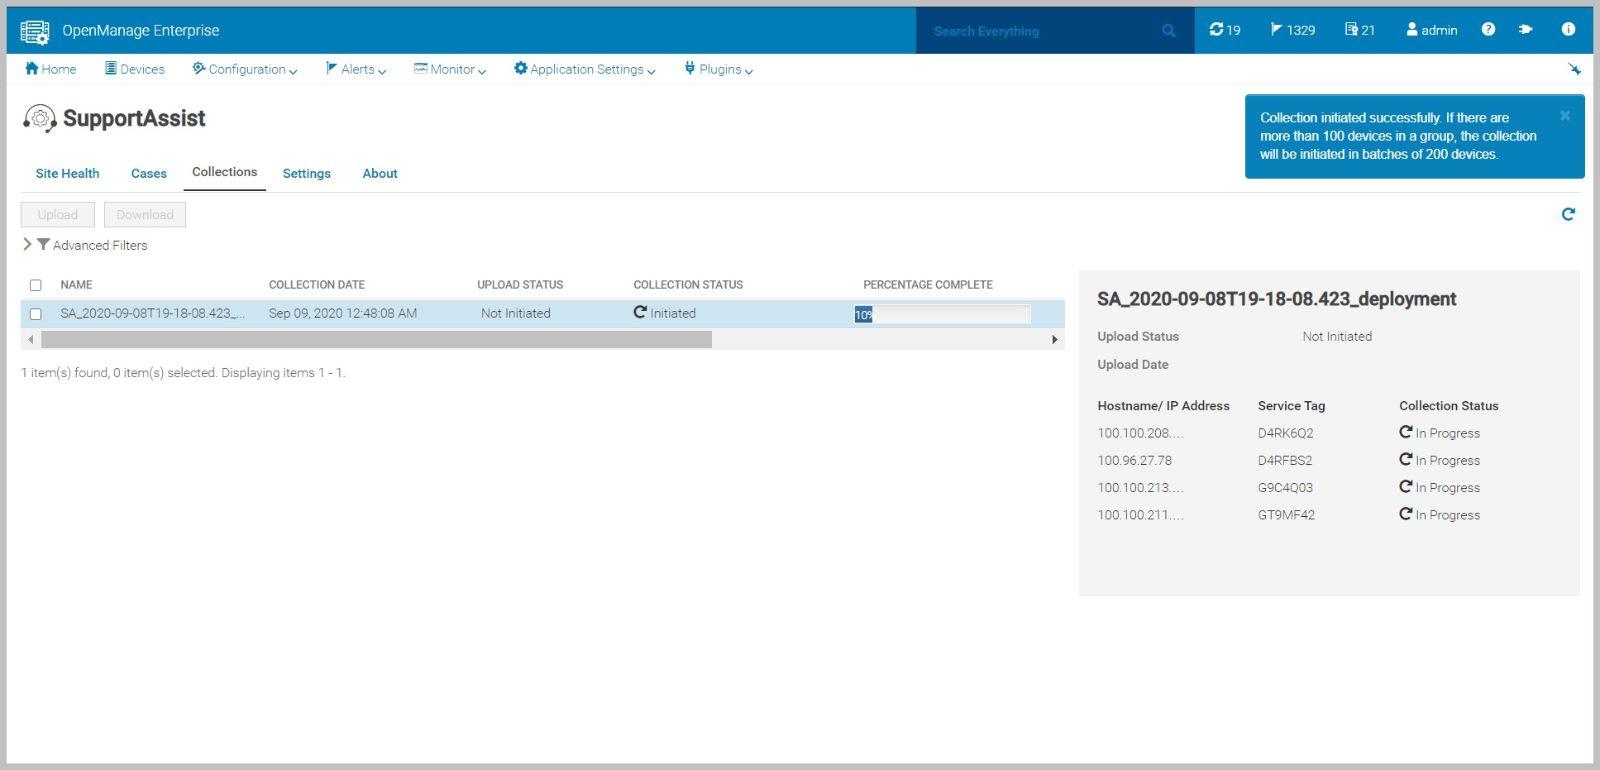 Dell EMC OpenManage Enterprise SupportAssist